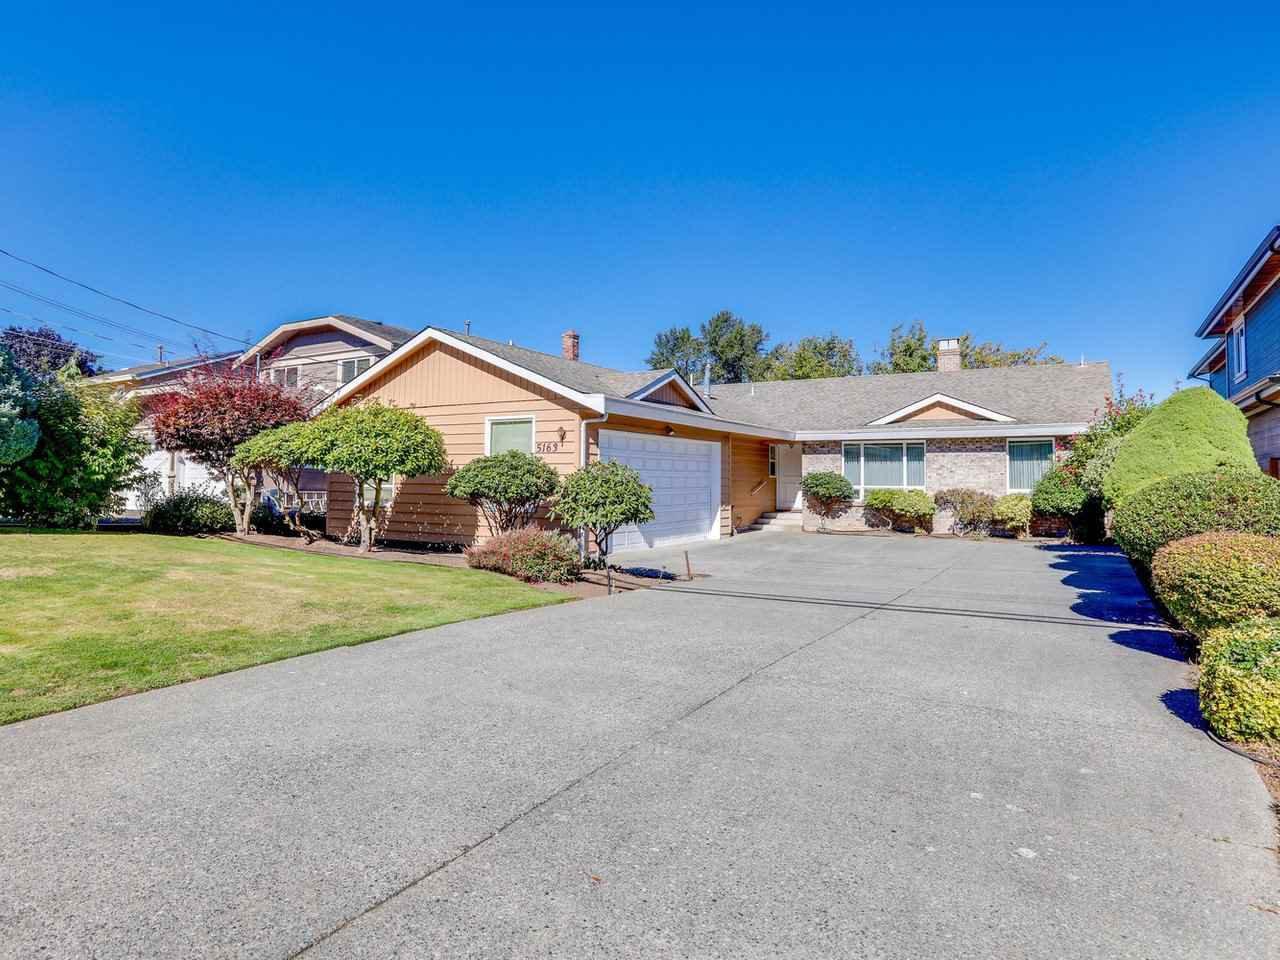 "Main Photo: 5163 2 Avenue in Delta: Pebble Hill House for sale in ""PEBBLE HILL"" (Tsawwassen)  : MLS®# R2504424"